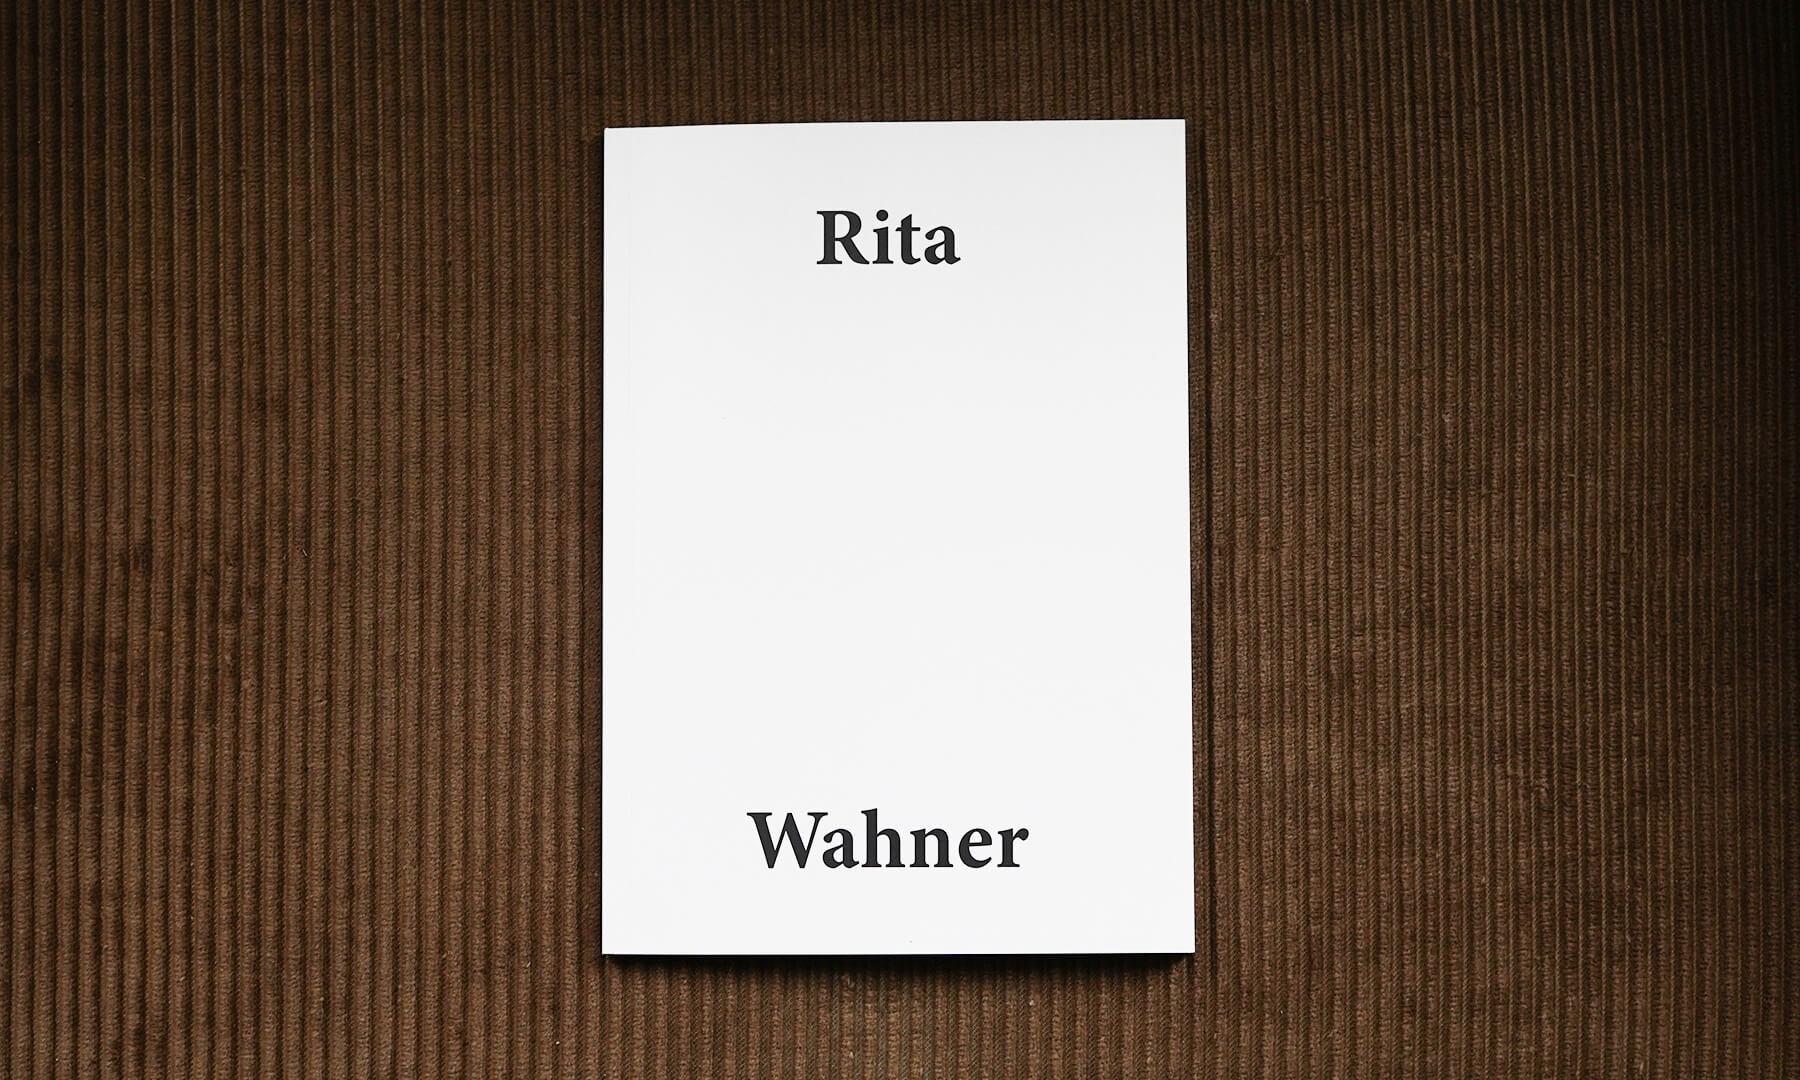 Rita-01